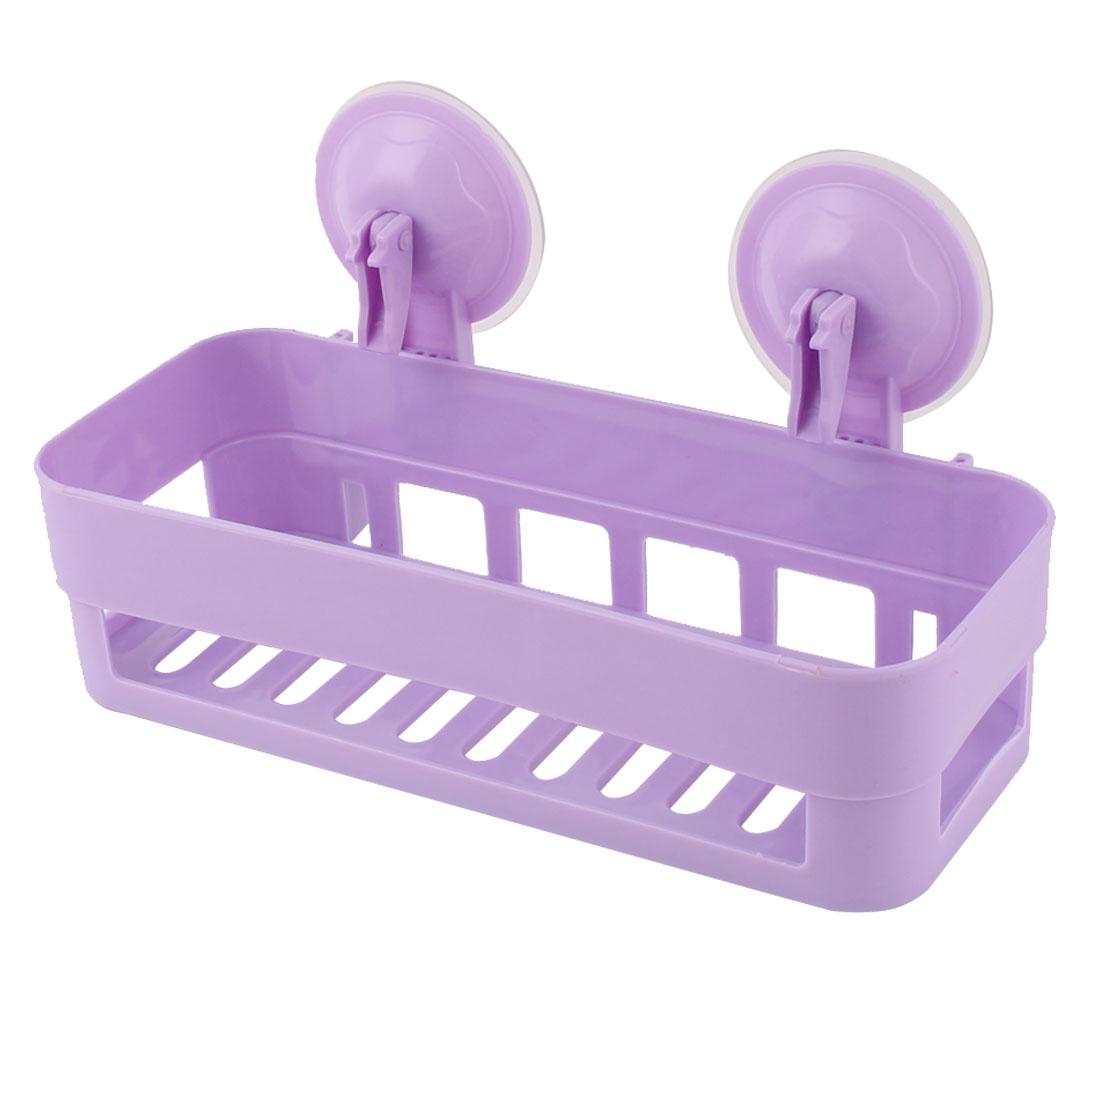 Bathroom Kitchen Plastic Suction Cup Toiletry Shelf Storage Rack Holder Purple